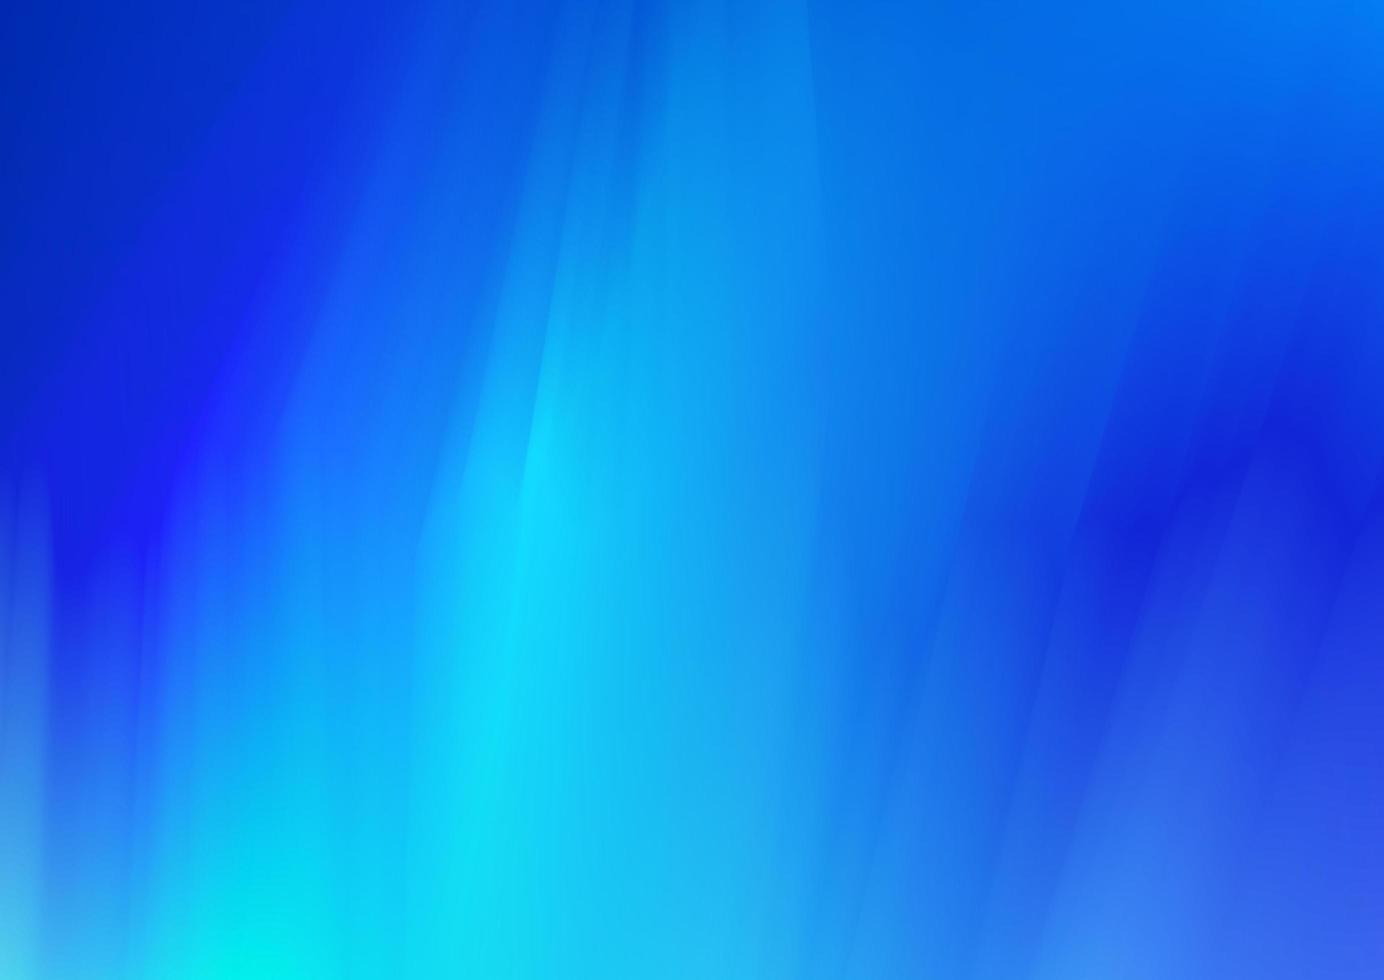 diseño abstracto azul mezcla vector